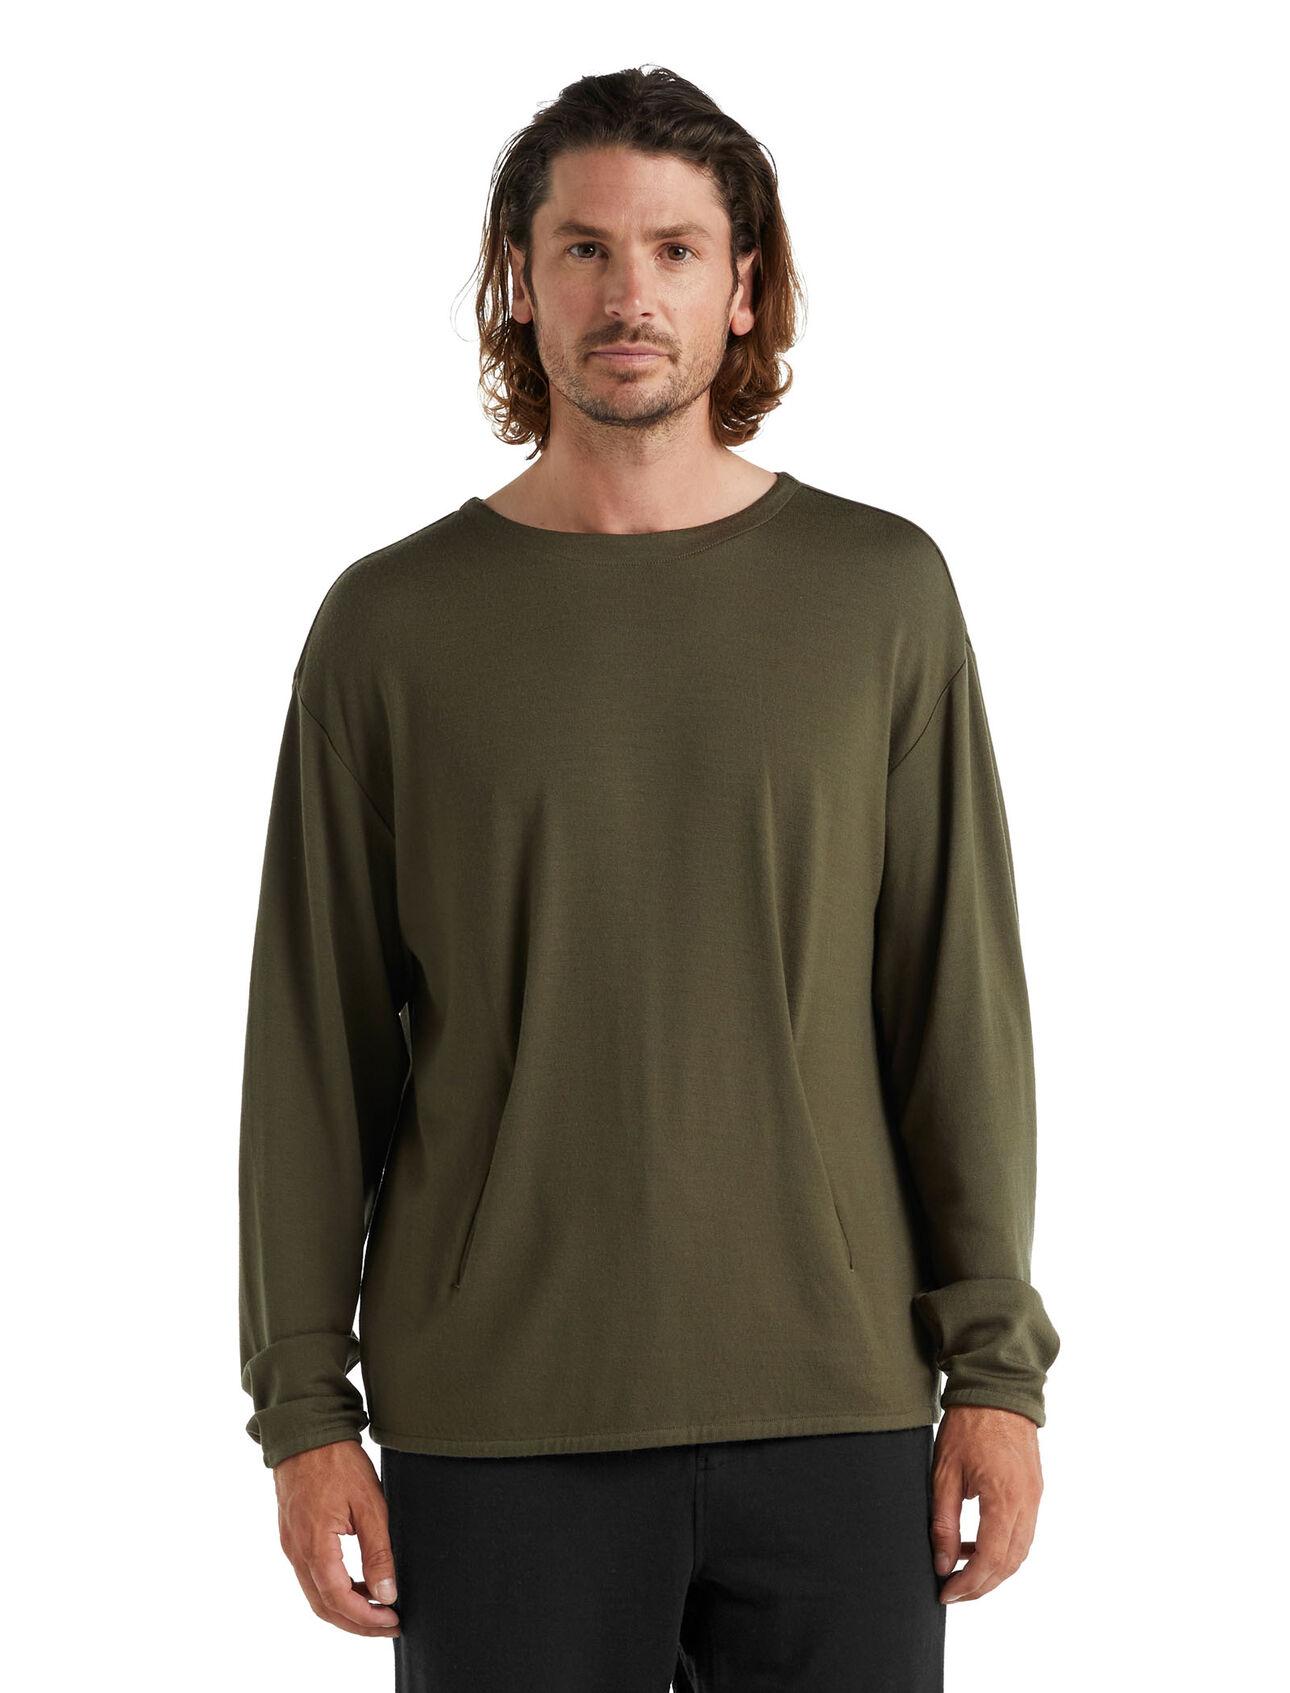 T-shirt manches longues col rond poche kangourou mérinos Deice